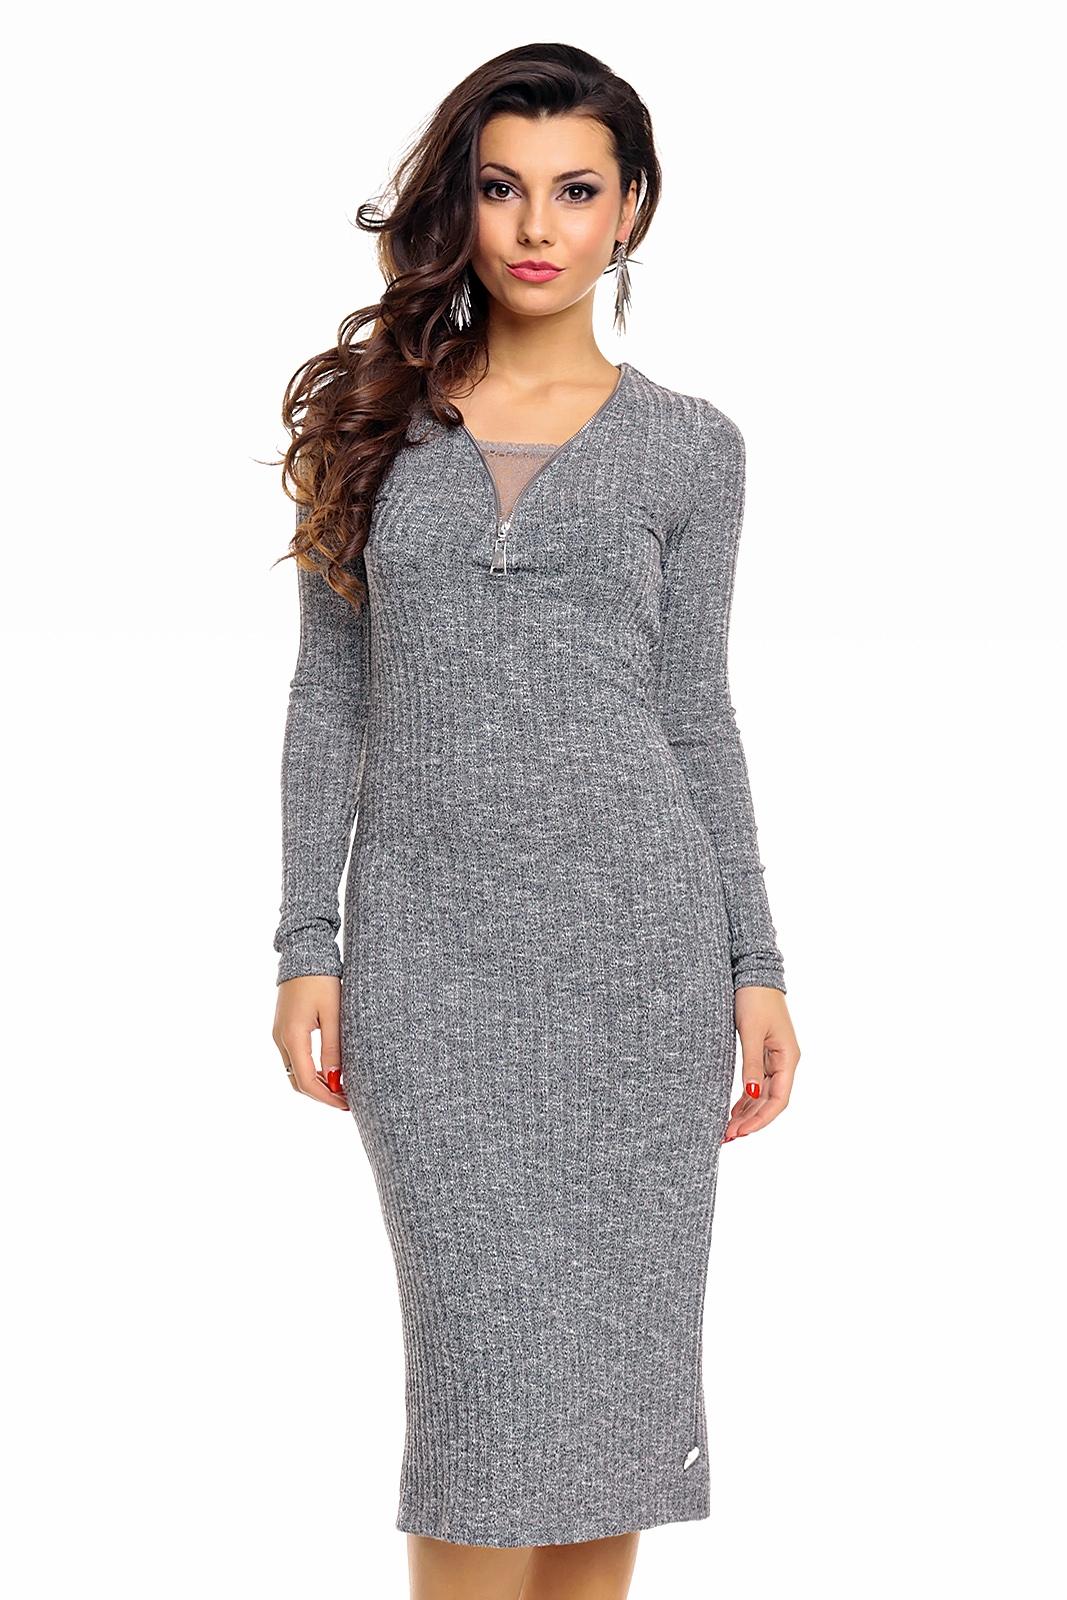 5eab612ed72c Úpletové dámské midi šaty Emma Ashley 2514 šedá